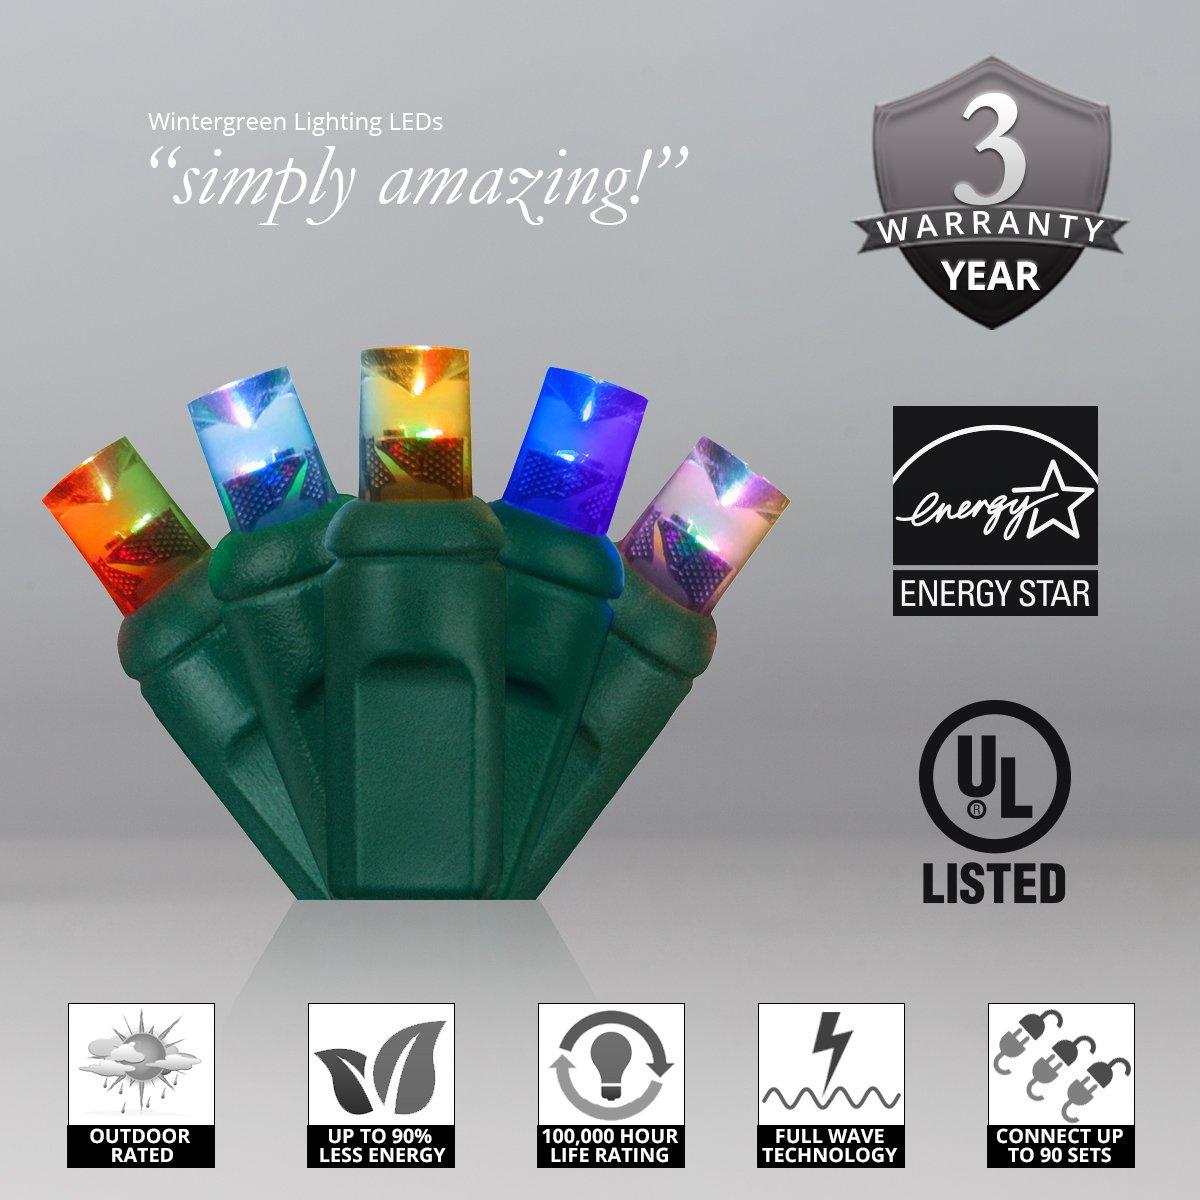 Amazon.com : Wintergreen Lighting 70 Light Christmas Light : String ...